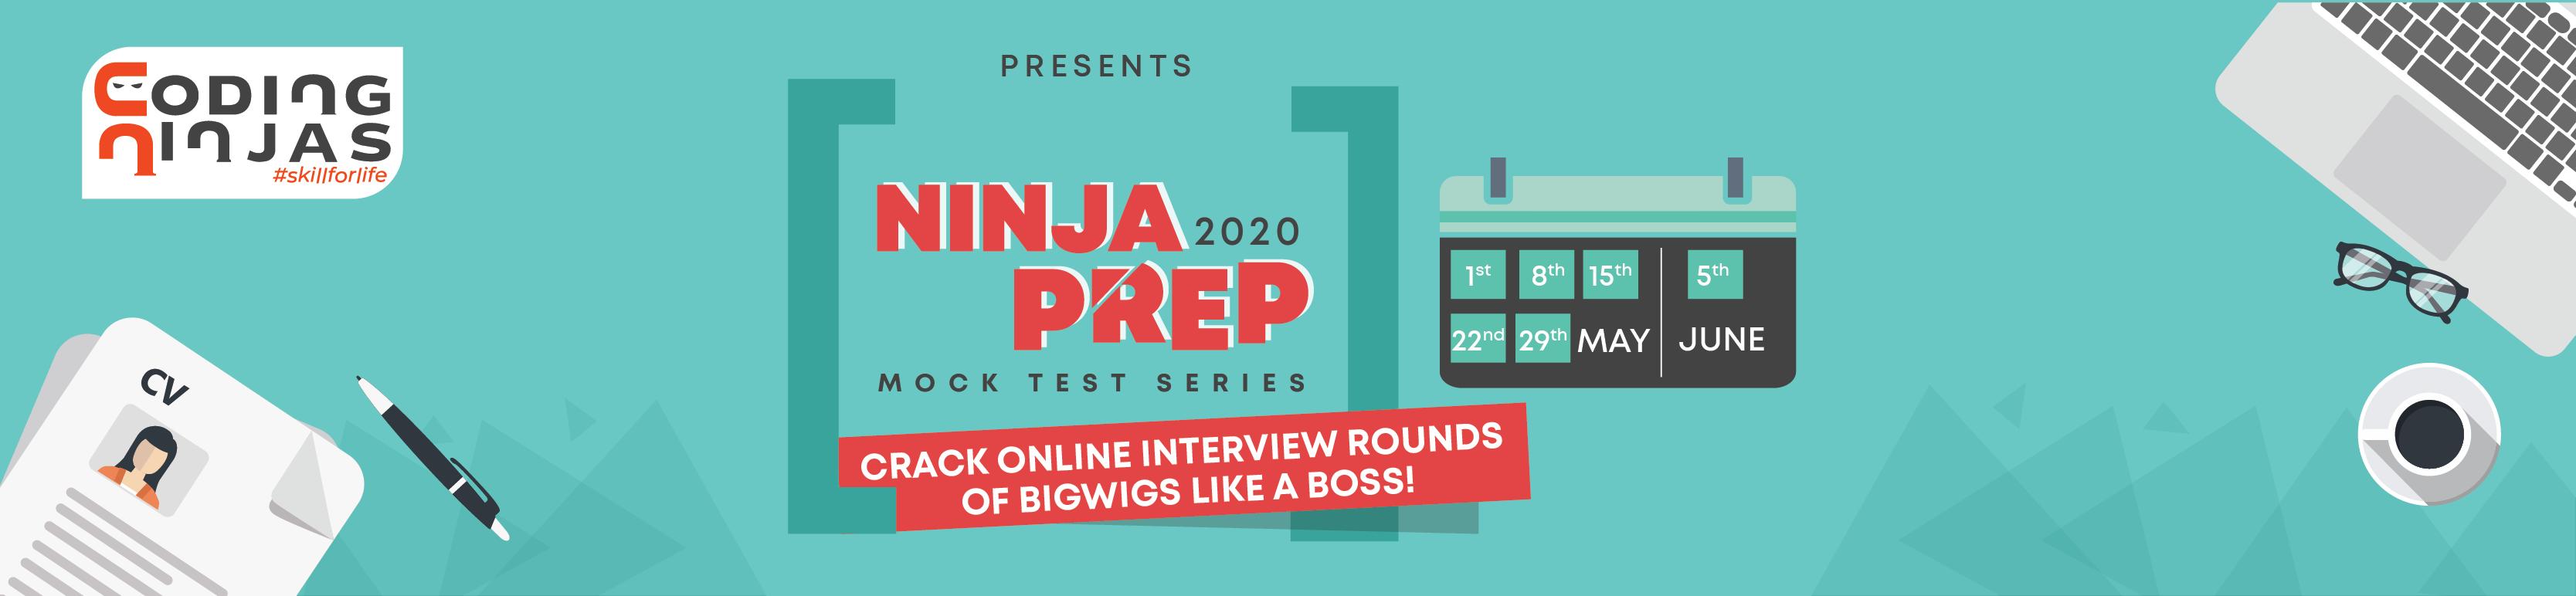 Ninja Prep'20